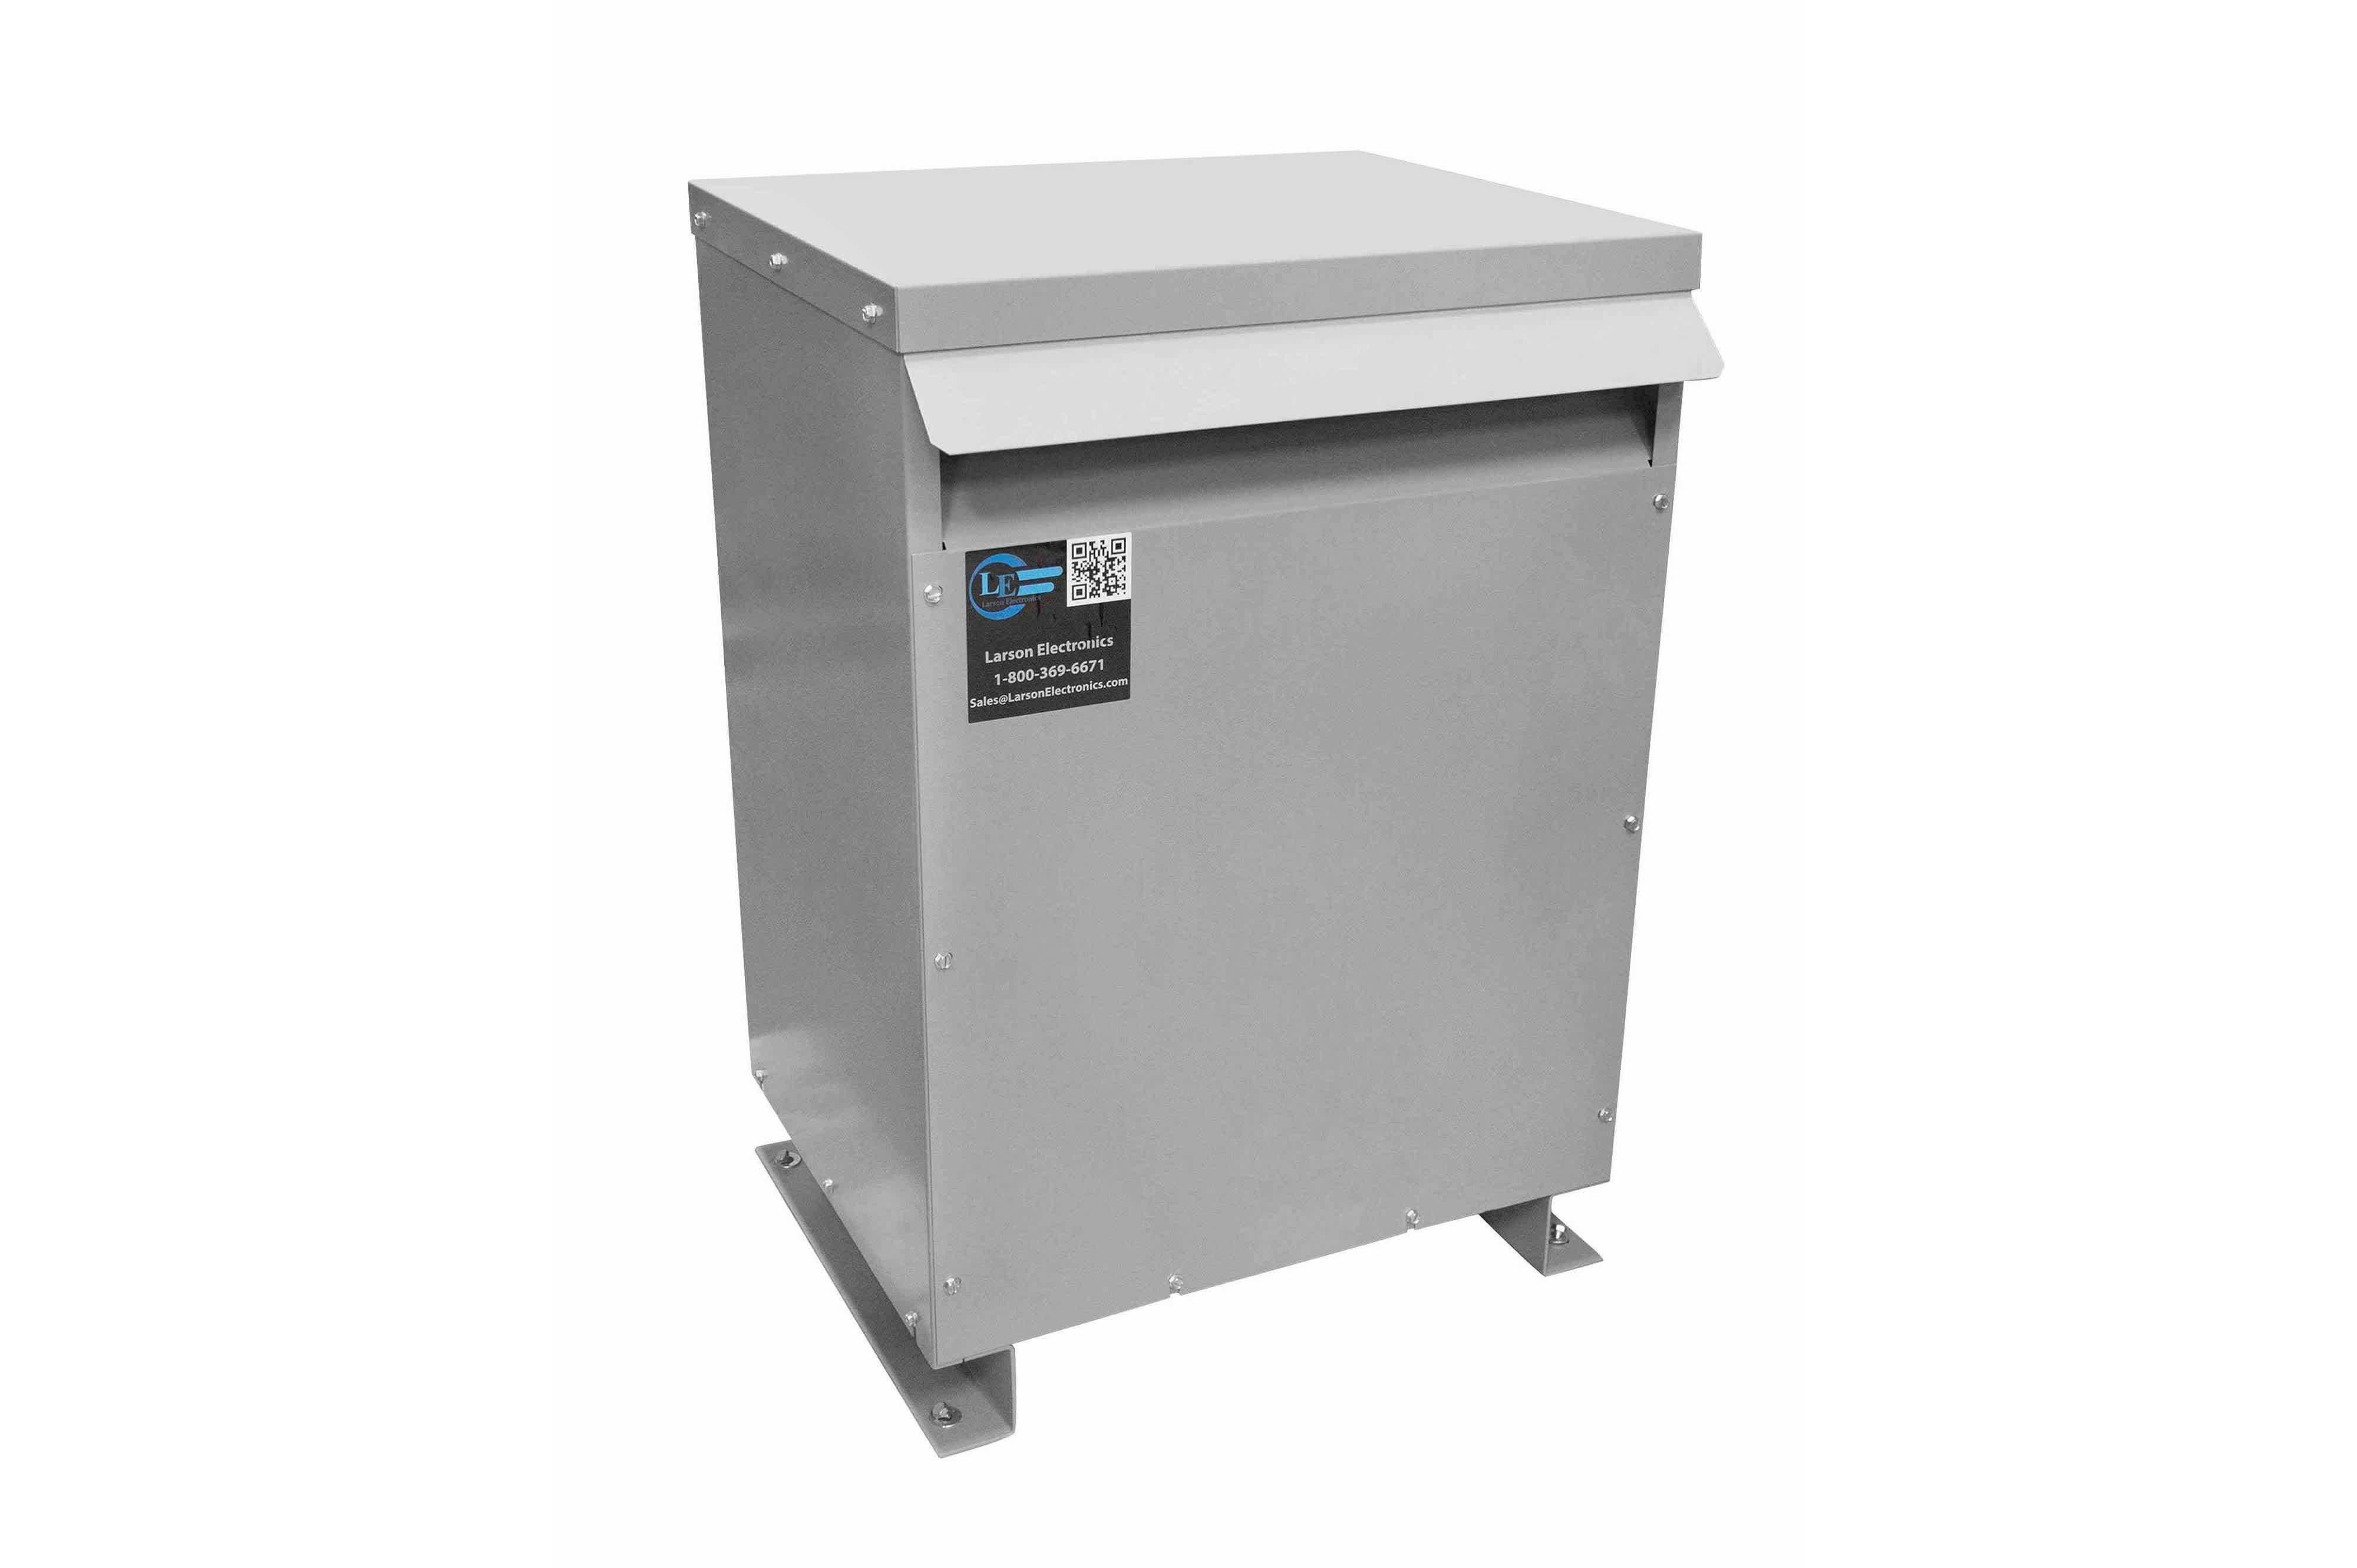 27 kVA 3PH Isolation Transformer, 480V Wye Primary, 240V/120 Delta Secondary, N3R, Ventilated, 60 Hz